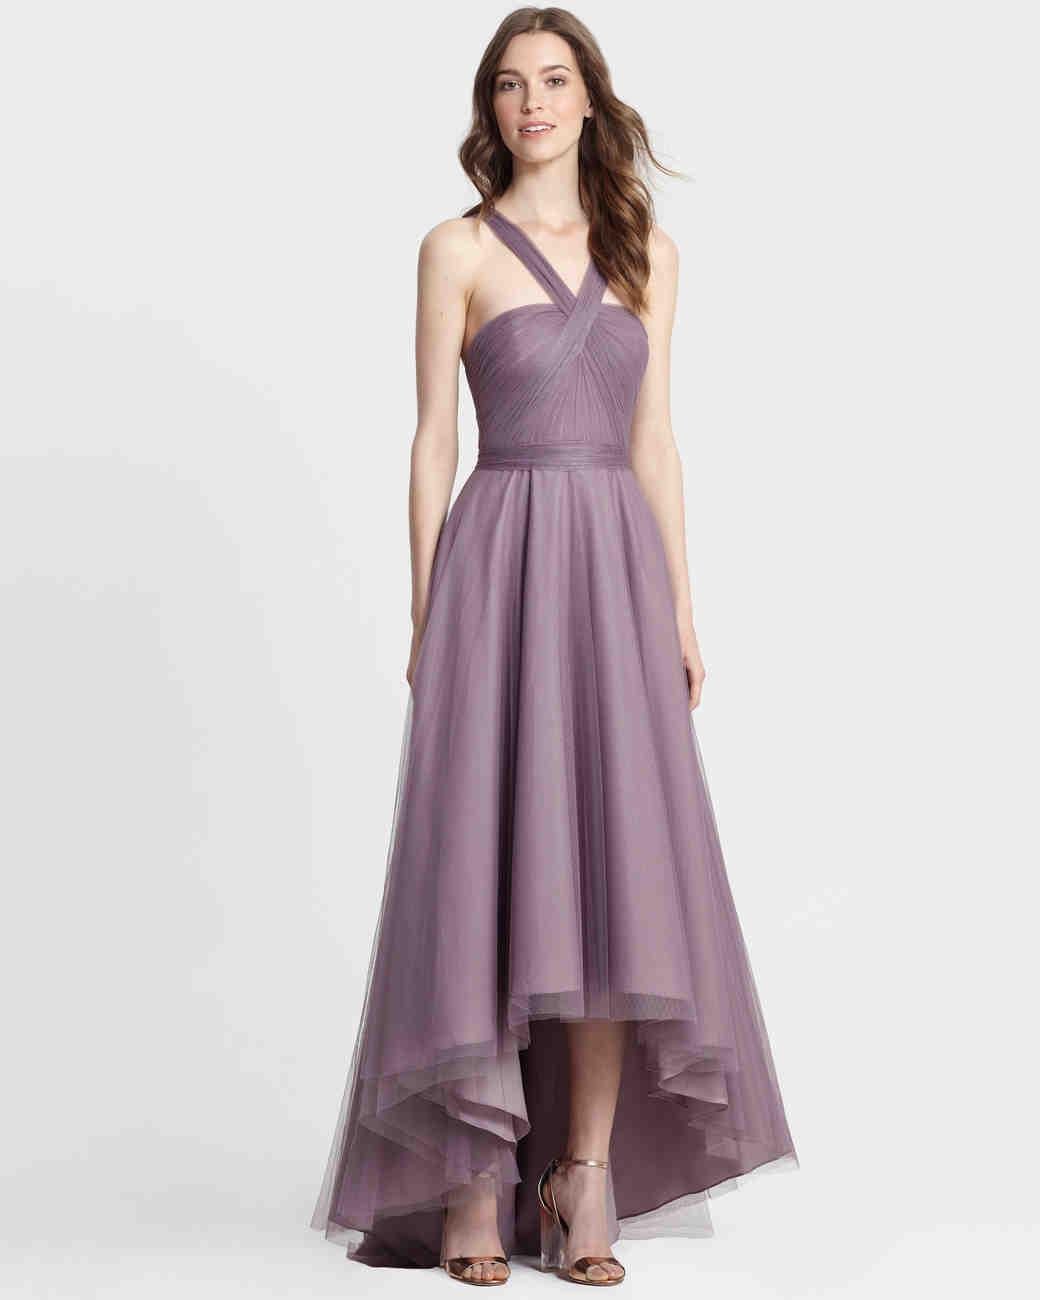 Purple bridesmaids dresses vosoi purple bridesmaid dresses martha stewart weddings ombrellifo Choice Image